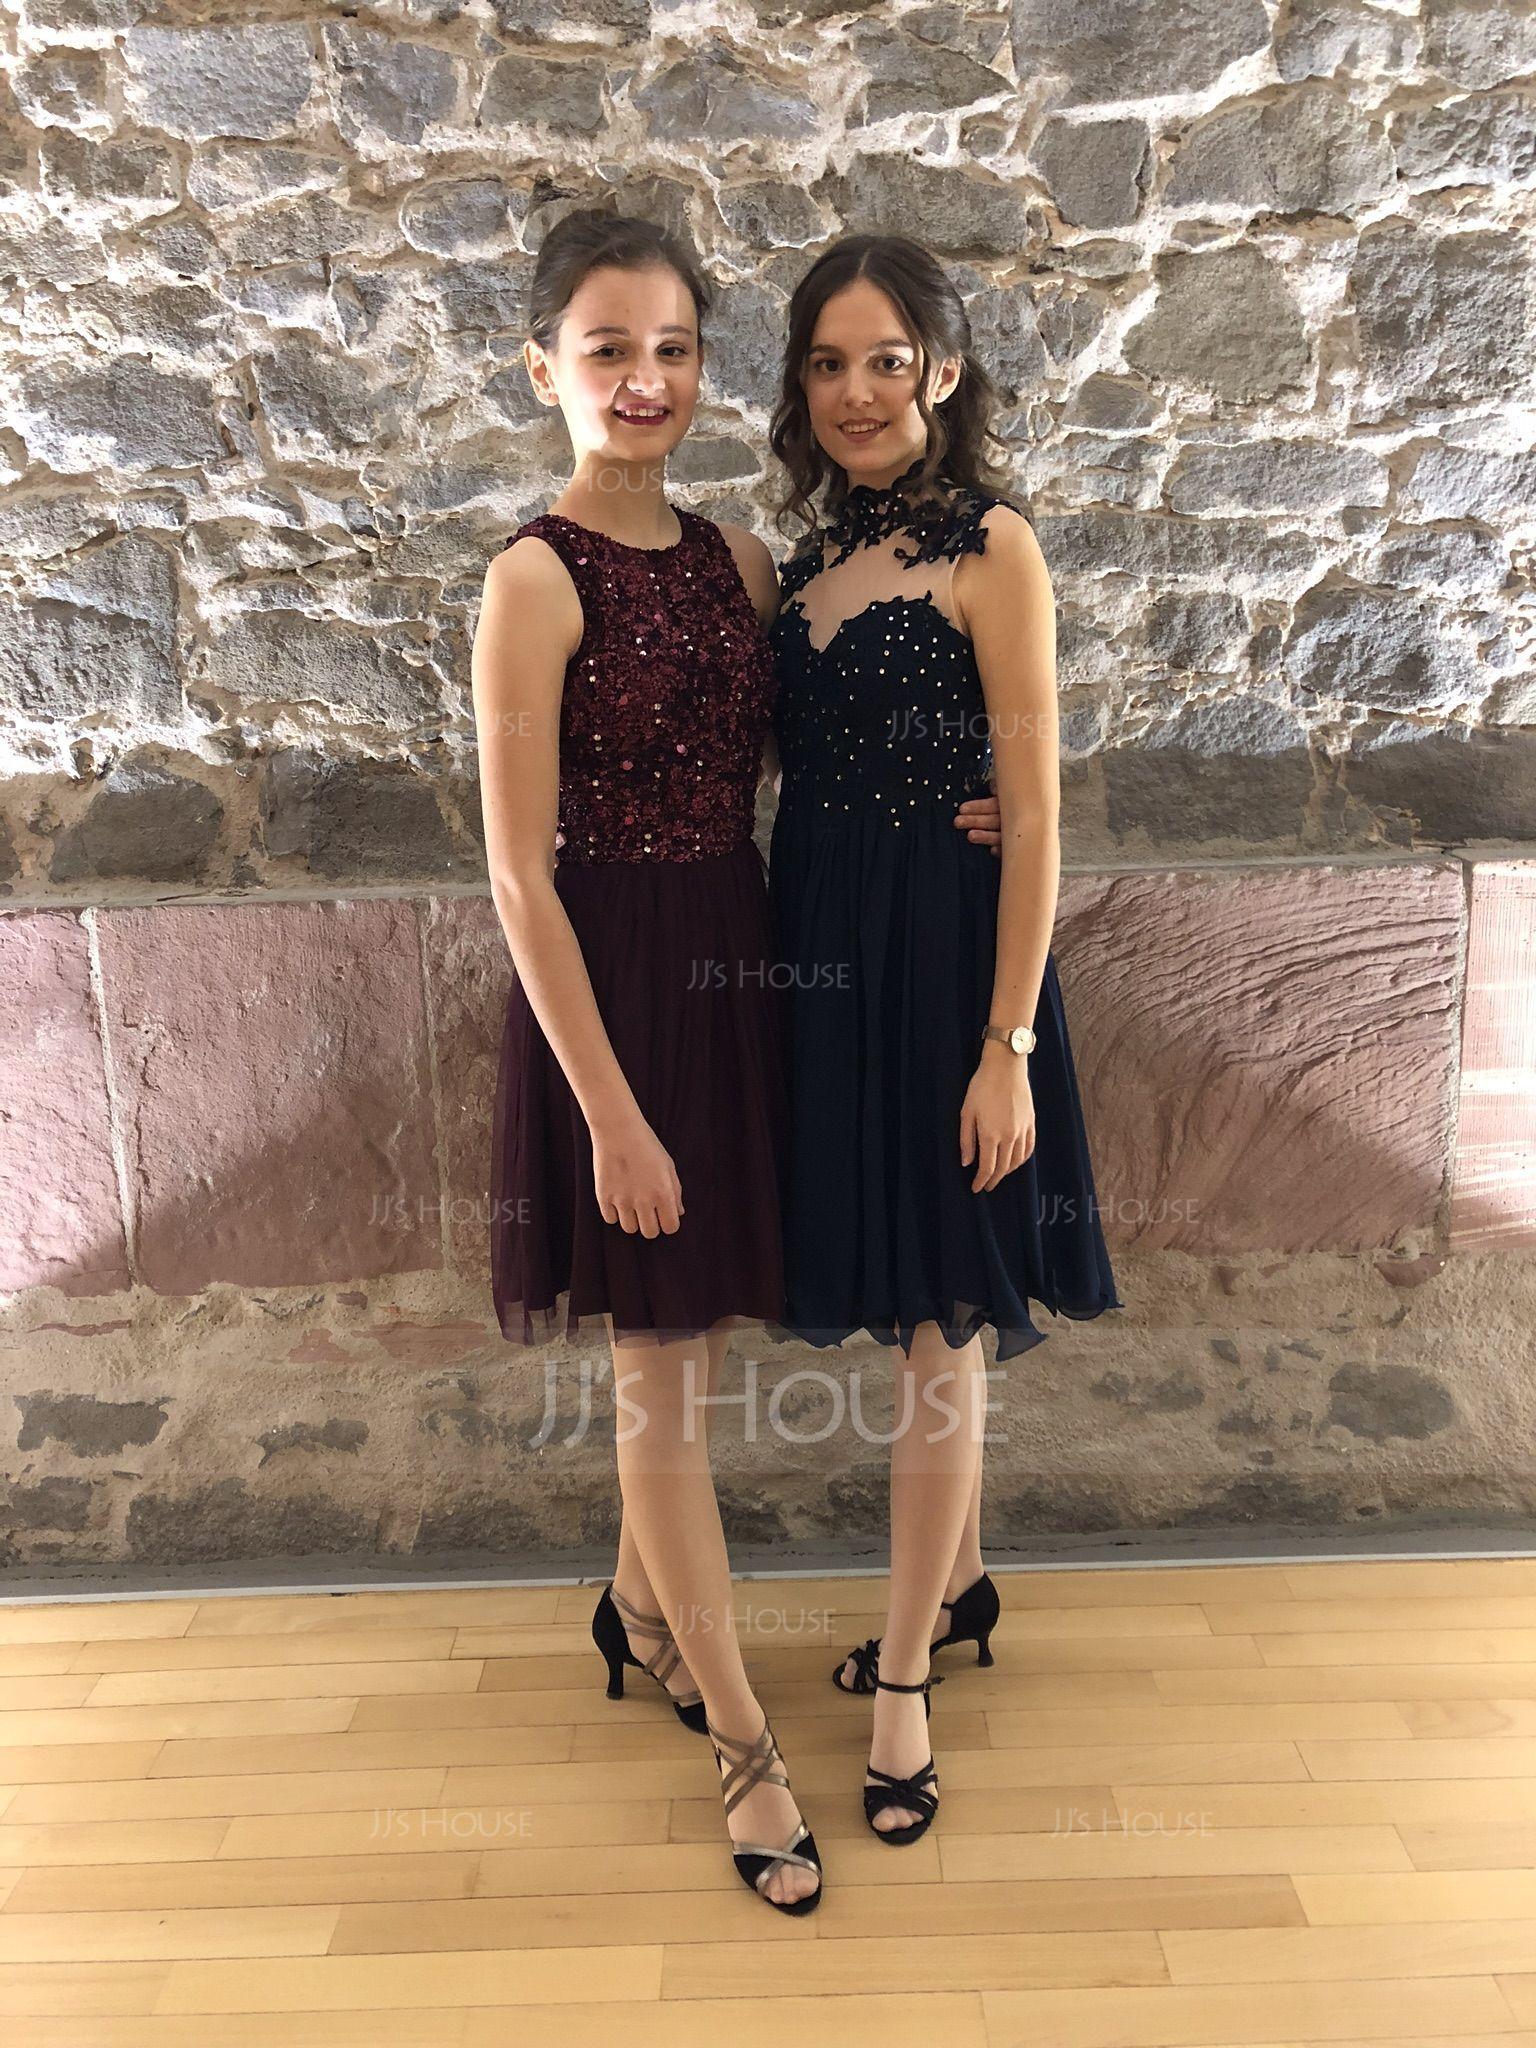 A-Line High Neck Knee-Length Chiffon Homecoming Dress (022120490)